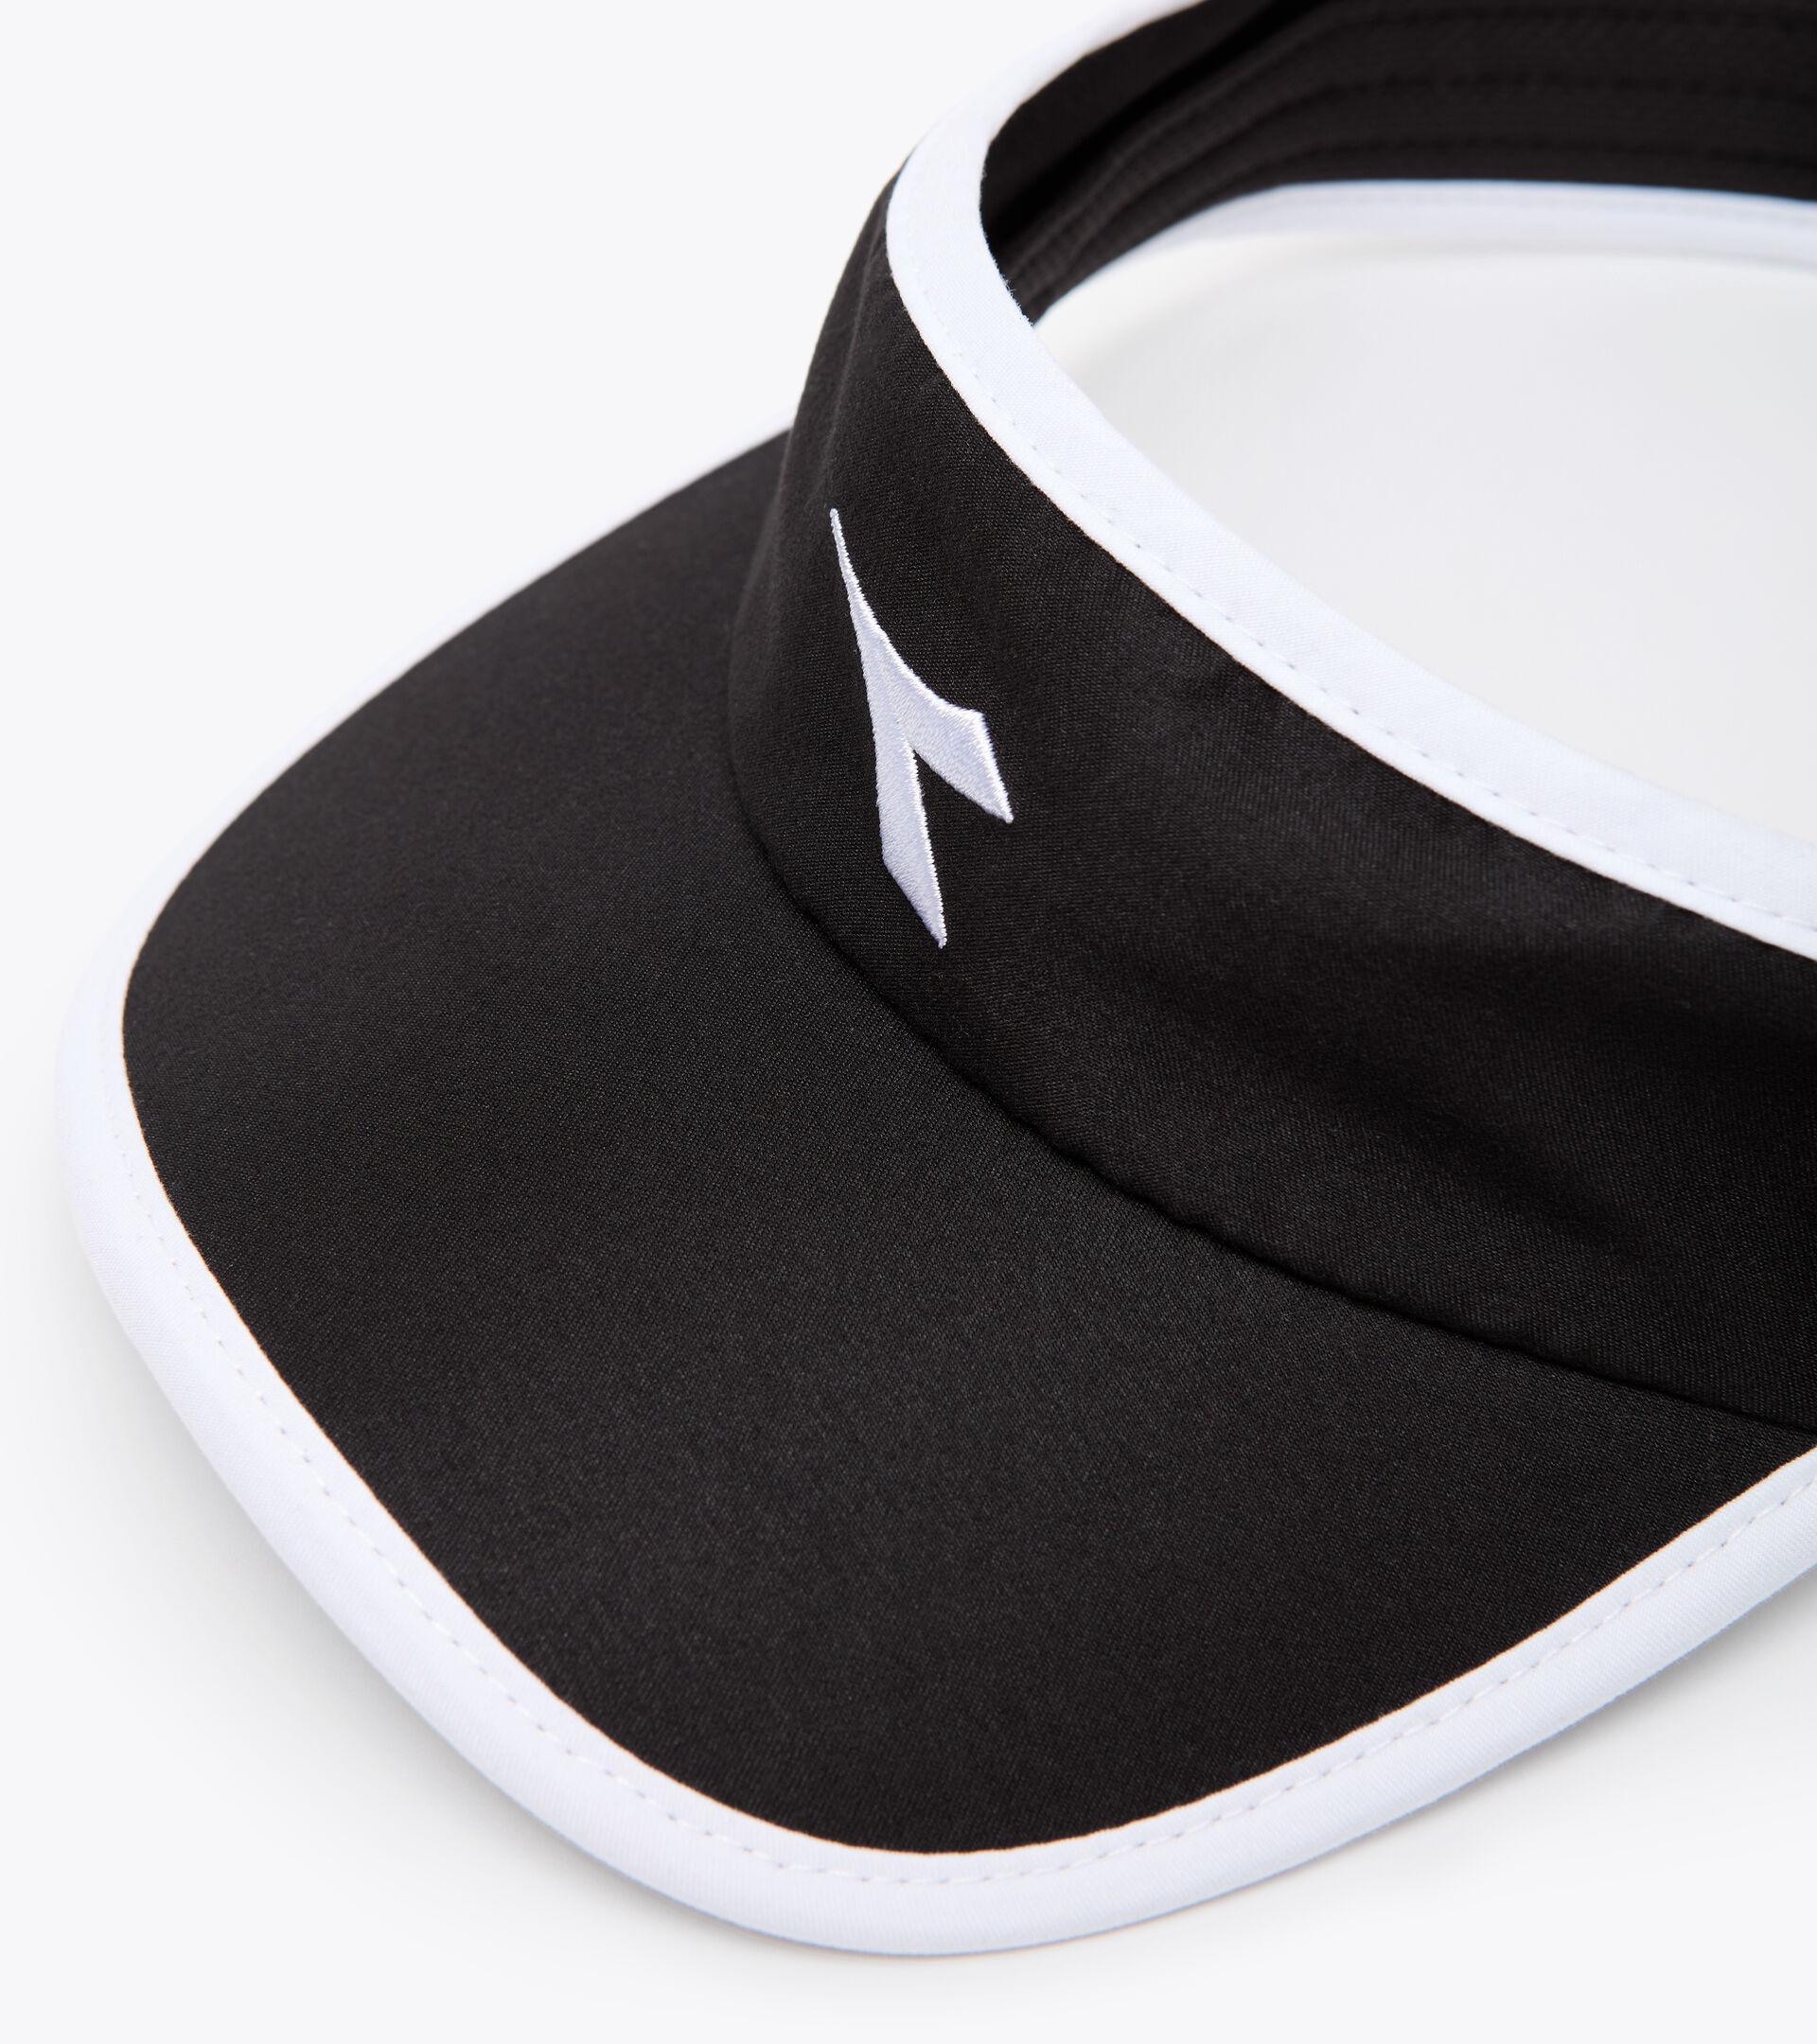 Tennis visor - Unisex VISOR BLACK/OPTICAL WHITE - Diadora